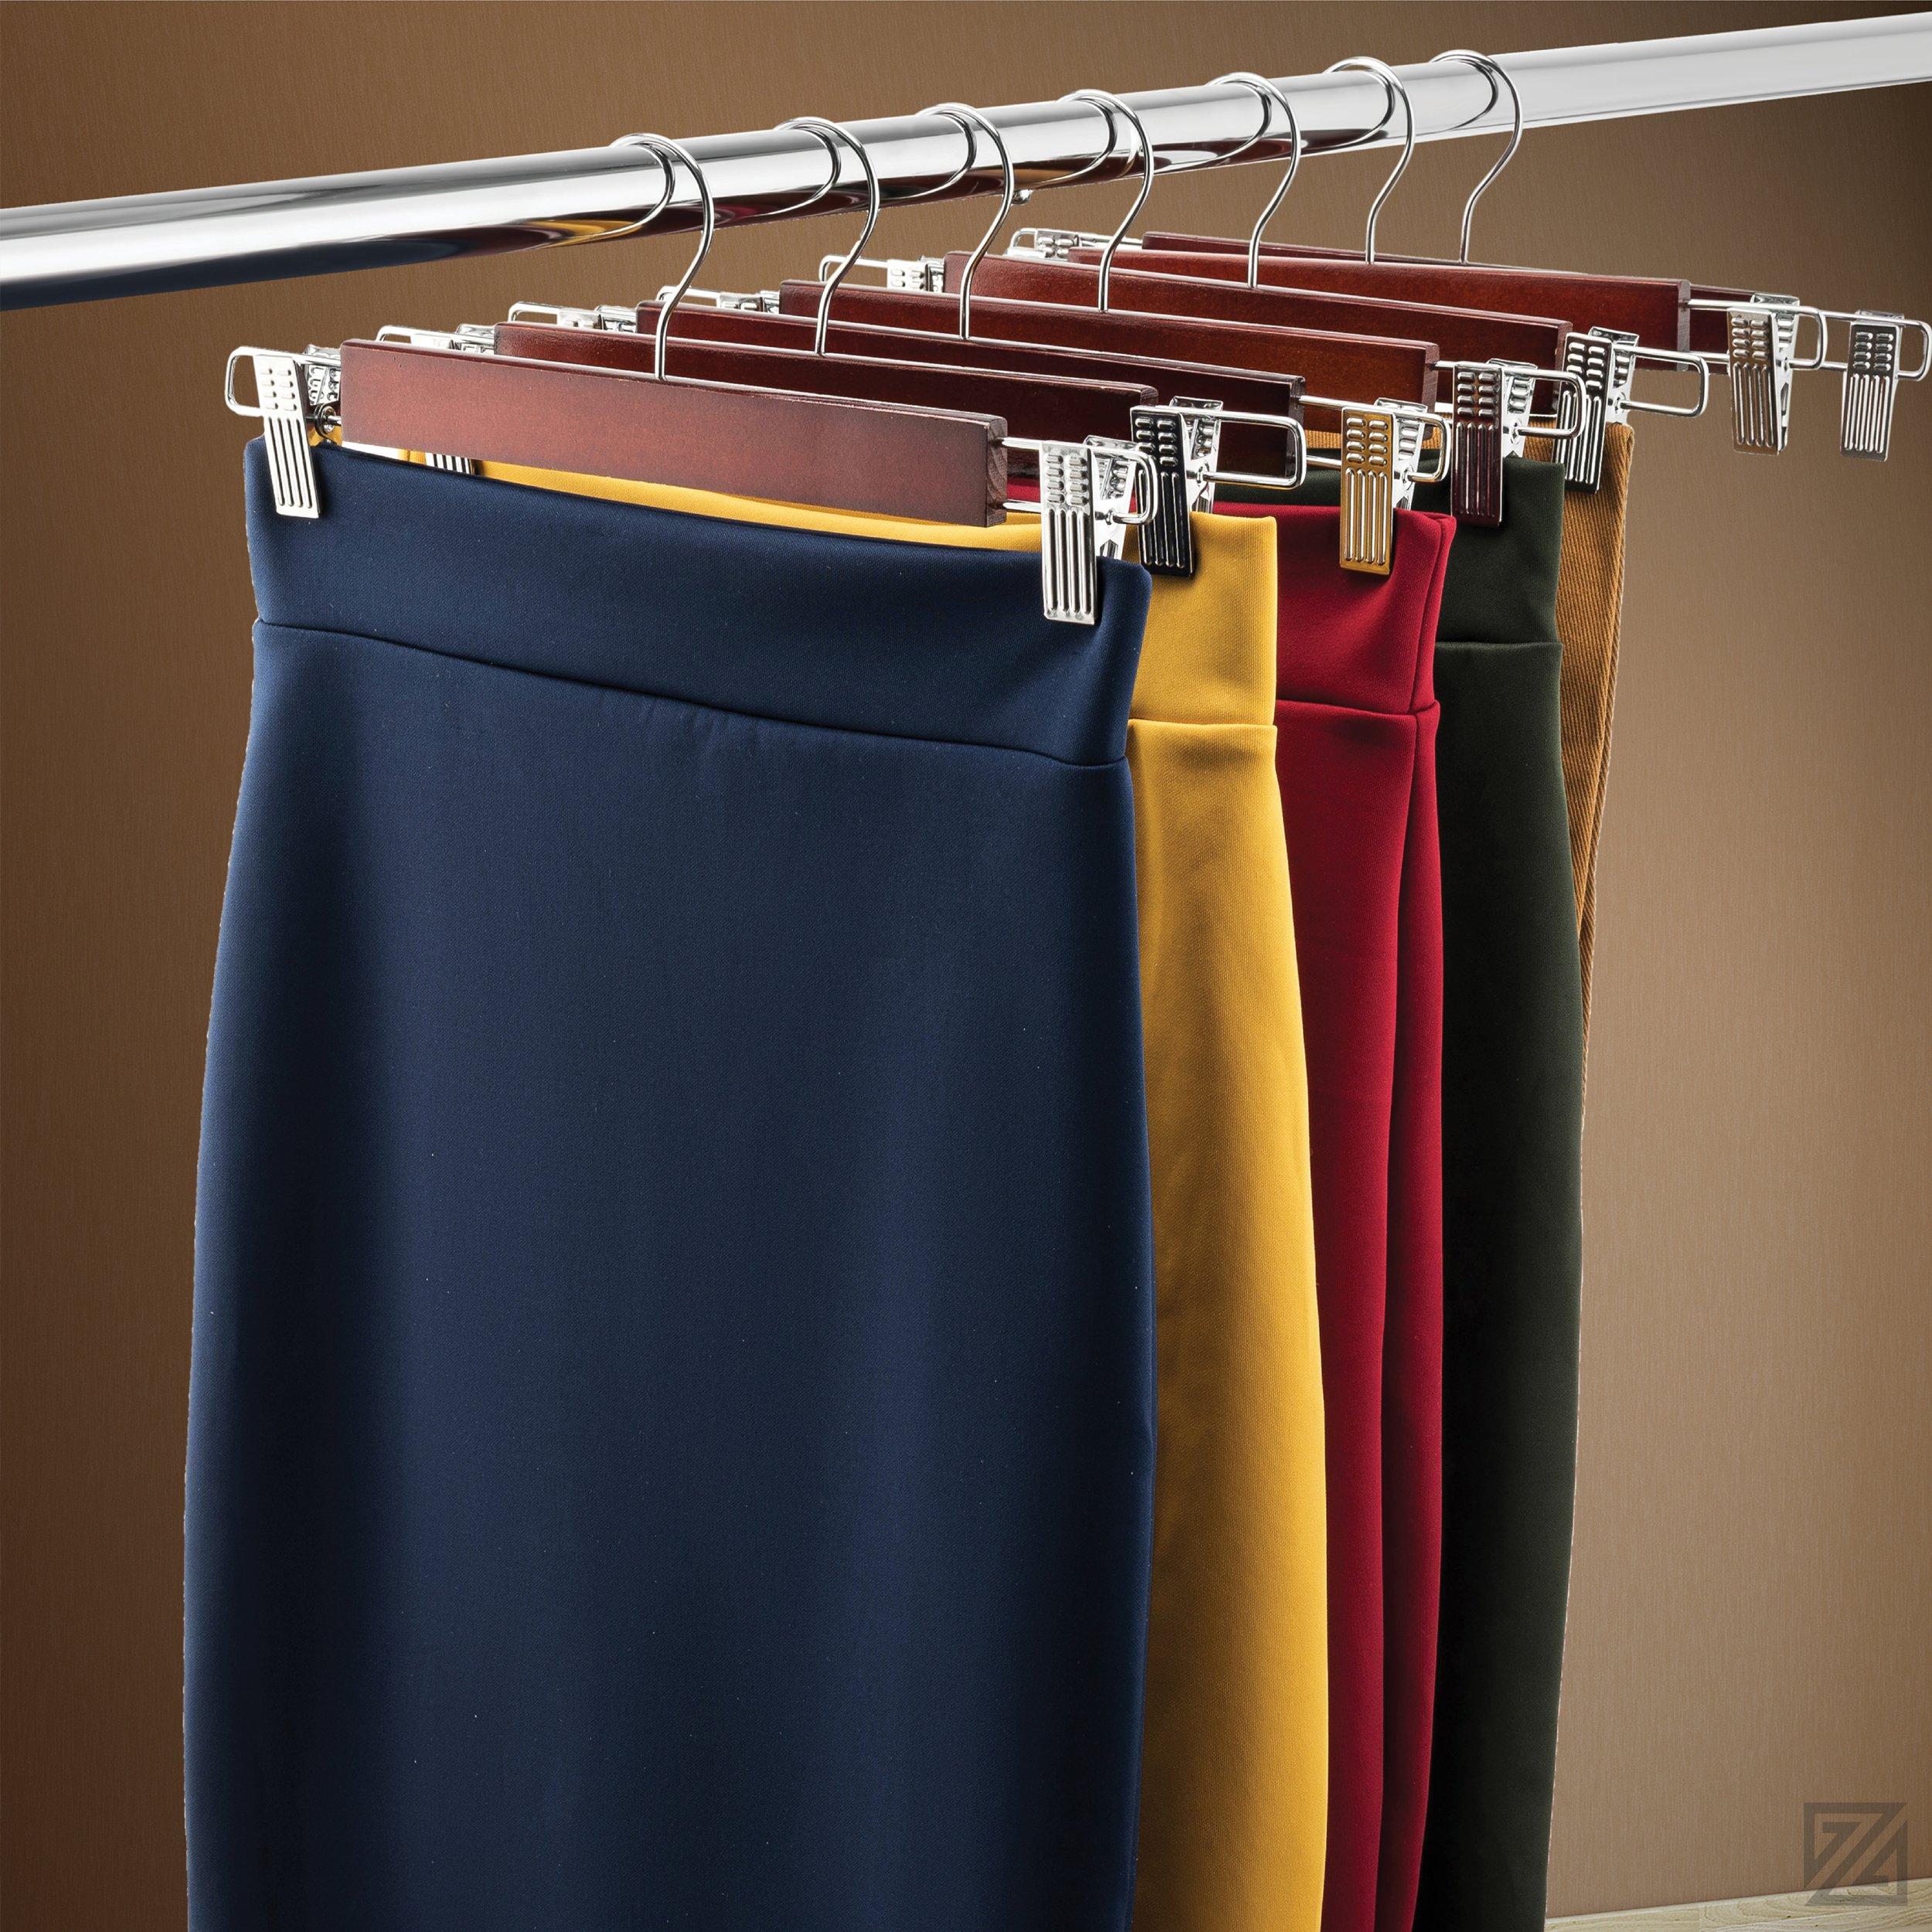 Zober Premium Wooden Skirt Hangers with Adjustable Clips (Pack of 10) Non-Slip Trouser Hanger Cherry Lotus Wood Pants hangers, 360 Degree Swivel Hook, for Skirts, Jeans, Slacks, Pants, 13'' Wide by ZOBER (Image #2)